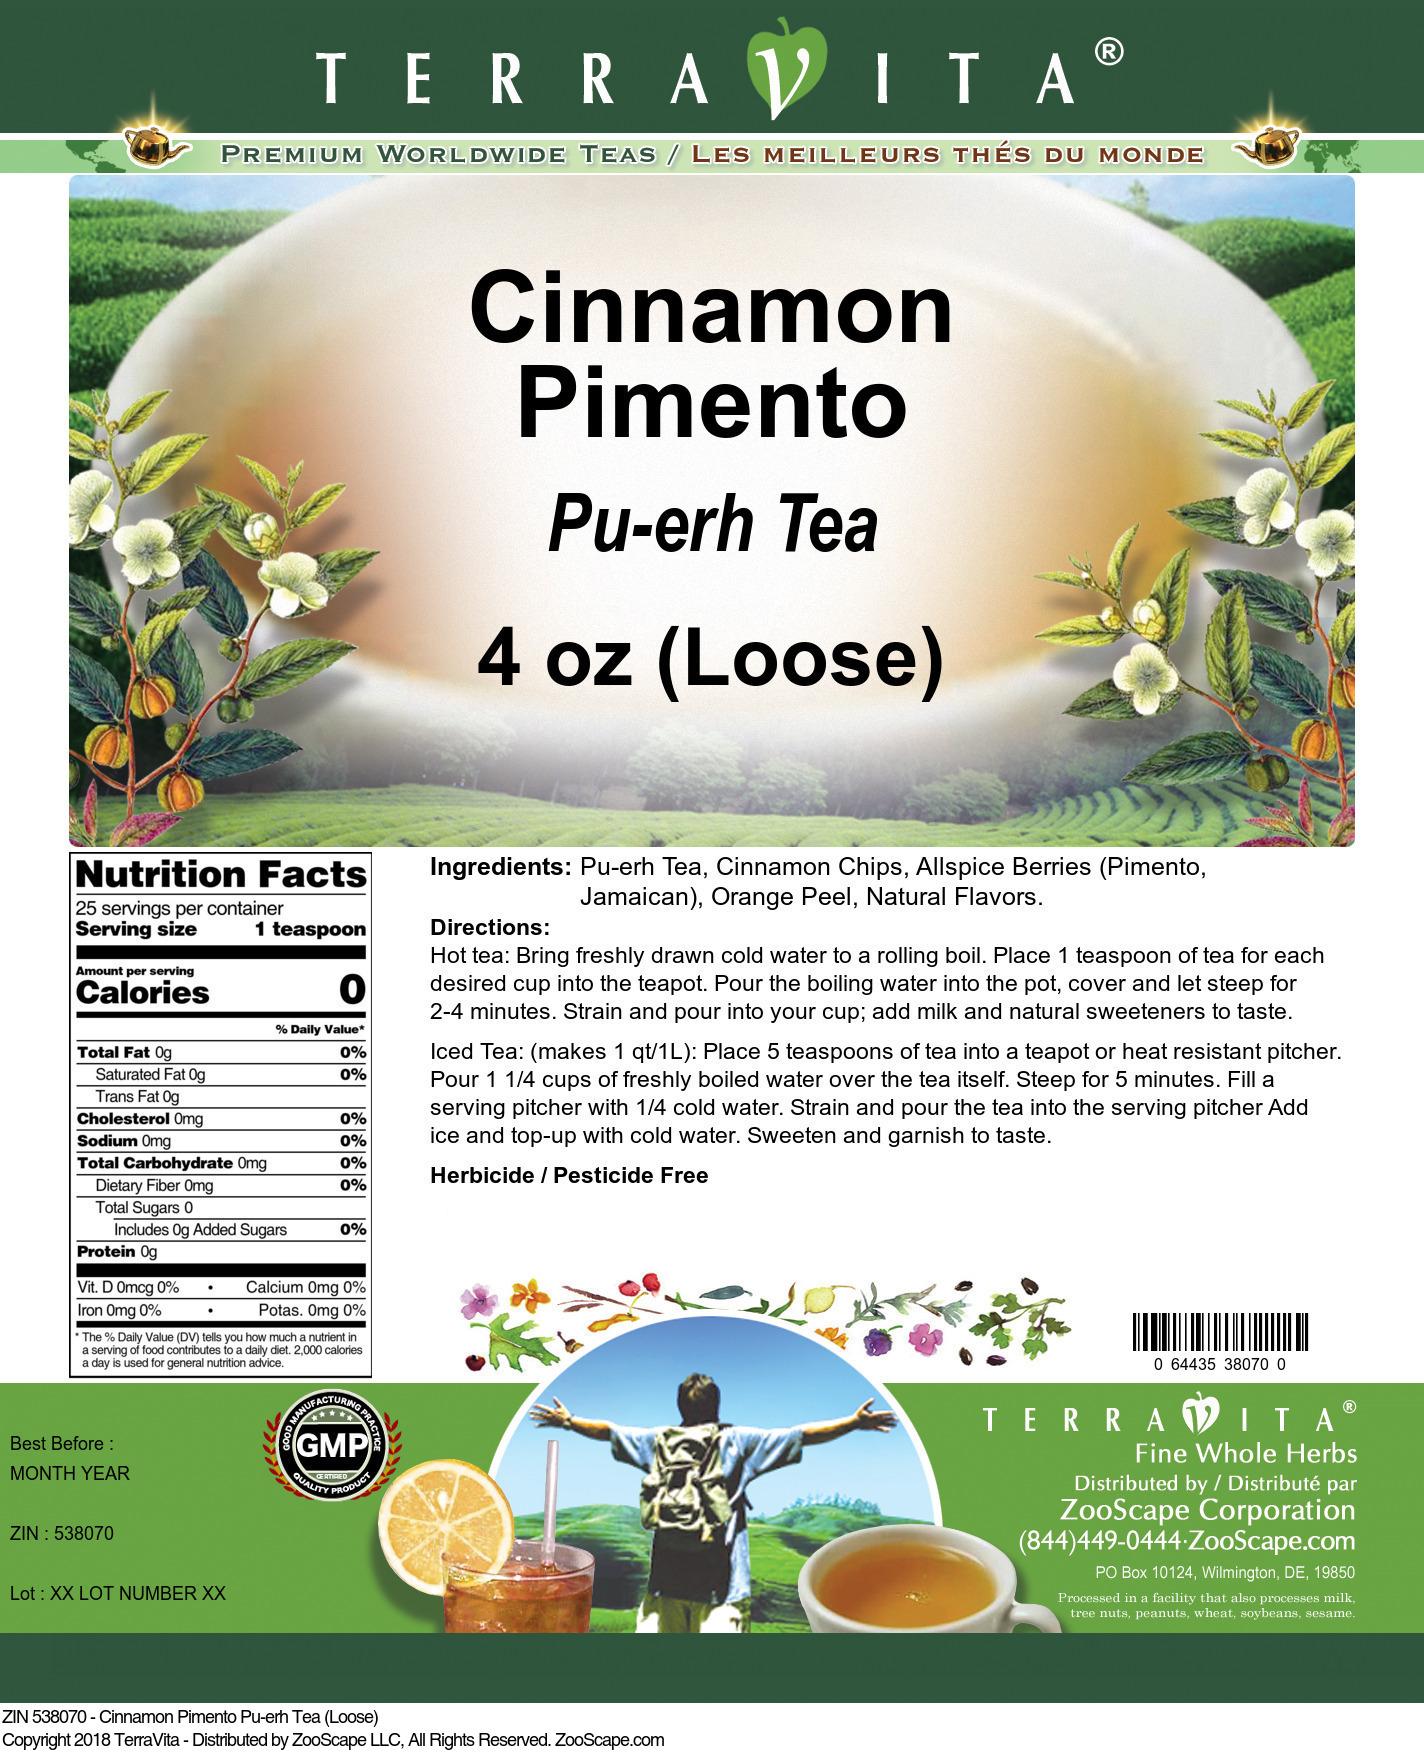 Cinnamon Pimento Pu-erh Tea (Loose)